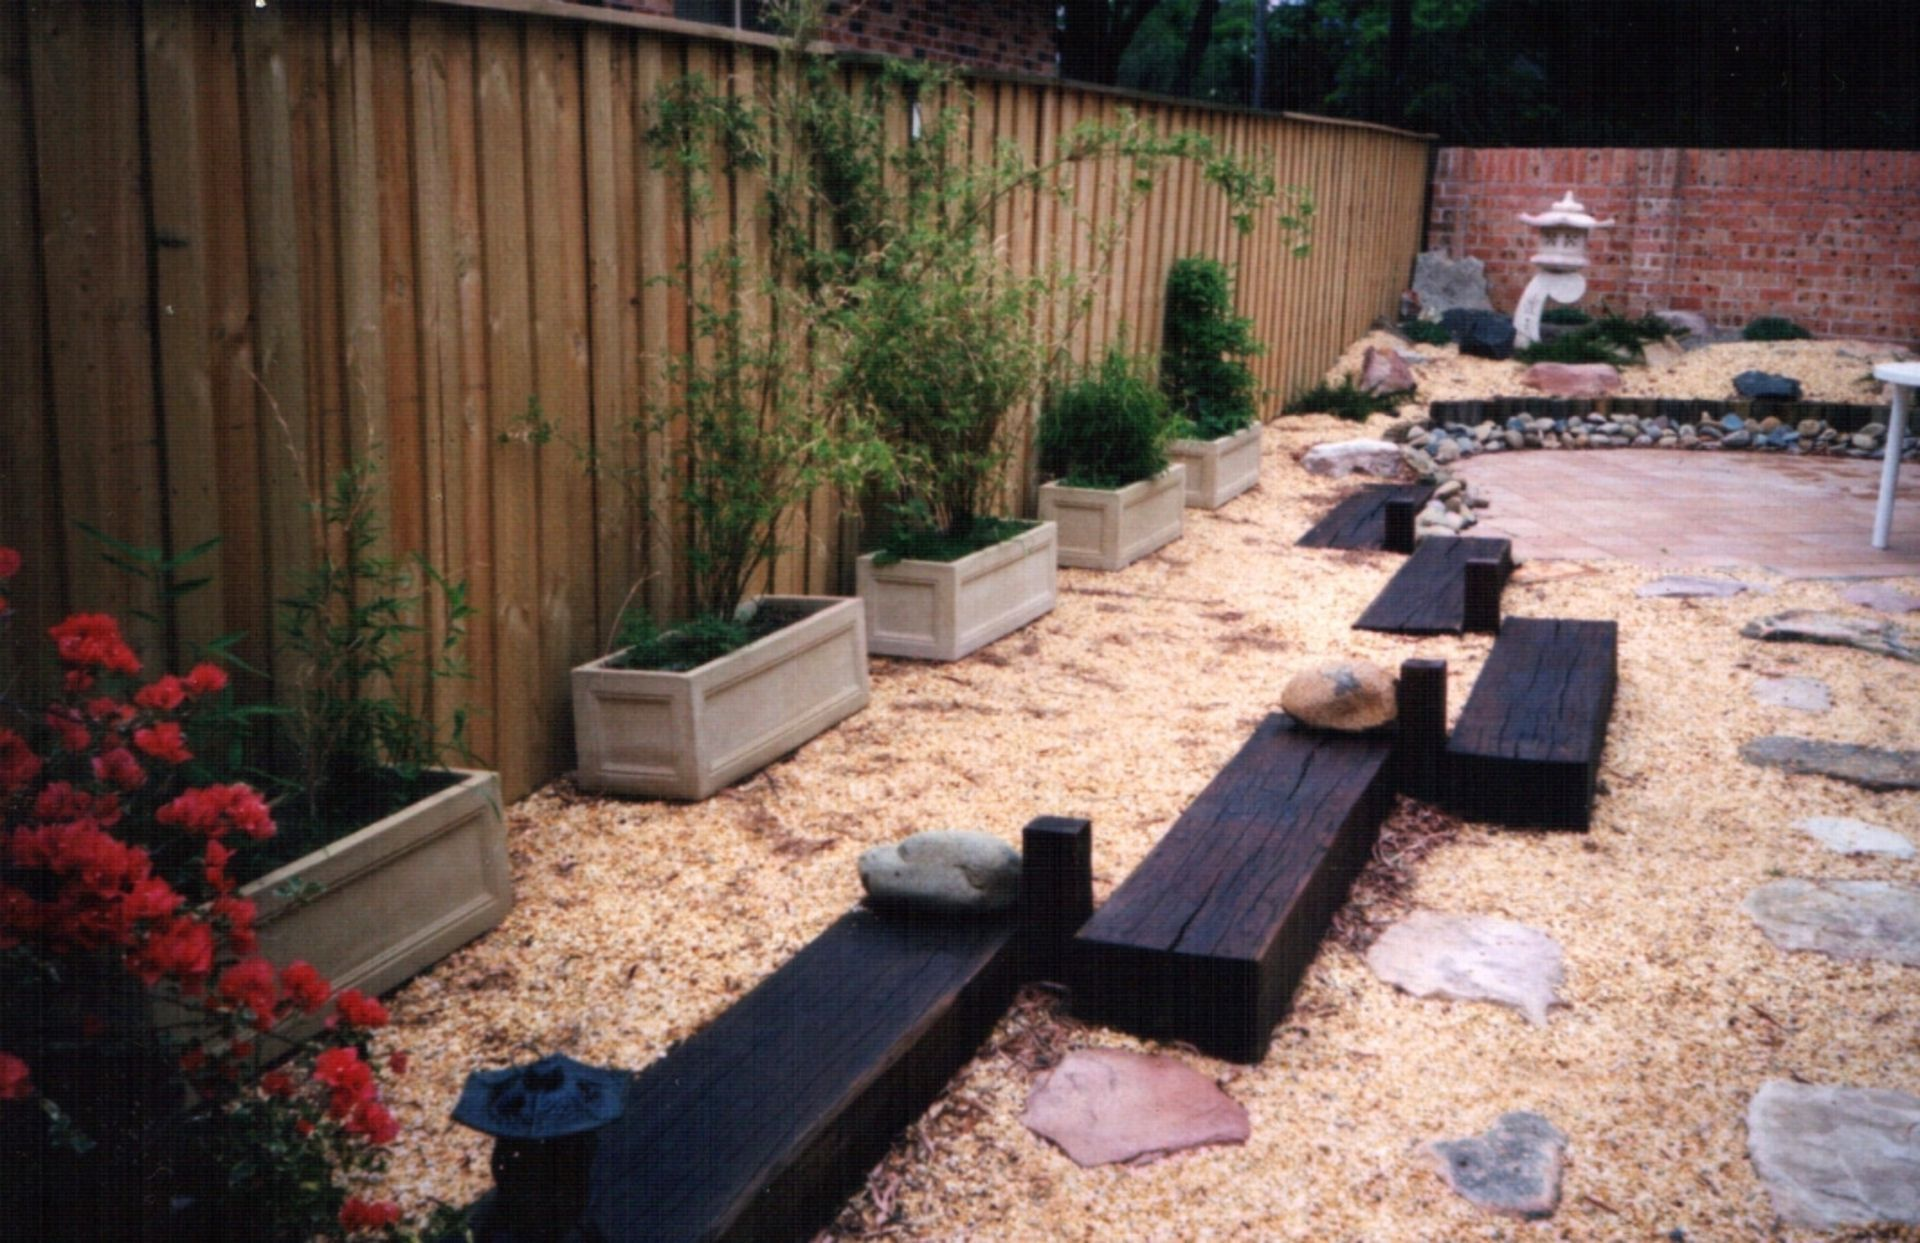 cheap backyard ideas no grass | Small front yard ... on Cheap Backyard Ideas No Grass  id=57864